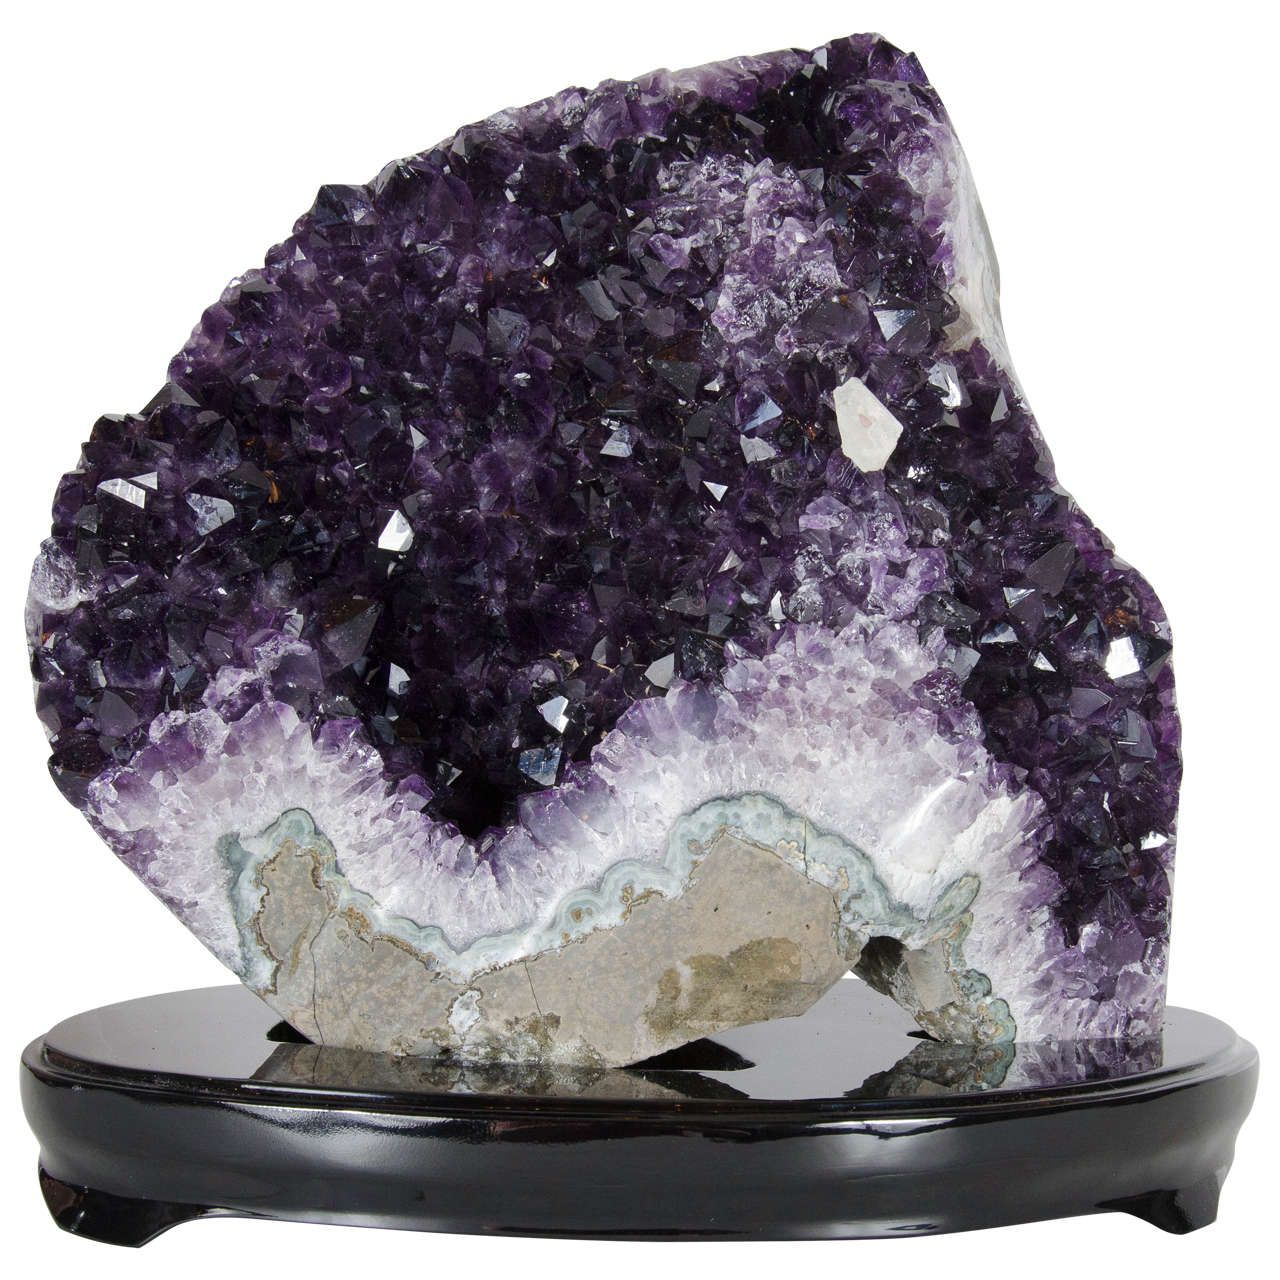 Spectacular And Monumental Natural Crystal Amethyst Rock Specimen 1stdibs Com Amethyst Rock Amethyst Crystals